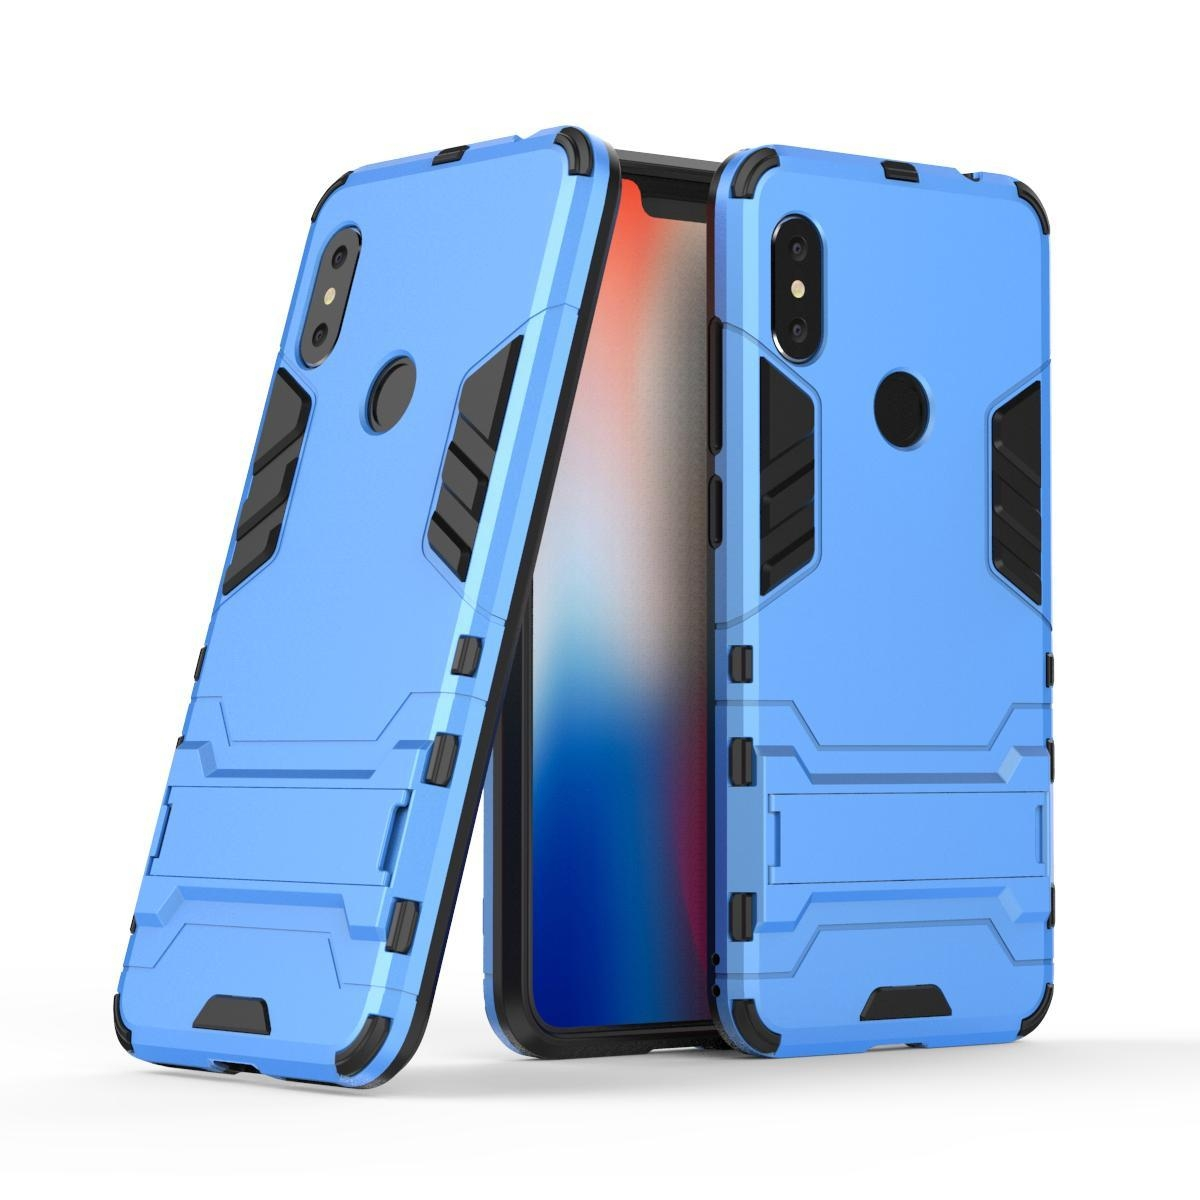 Generic Iron Man Hard Armor Case for Huawei Y7 Prime (2018